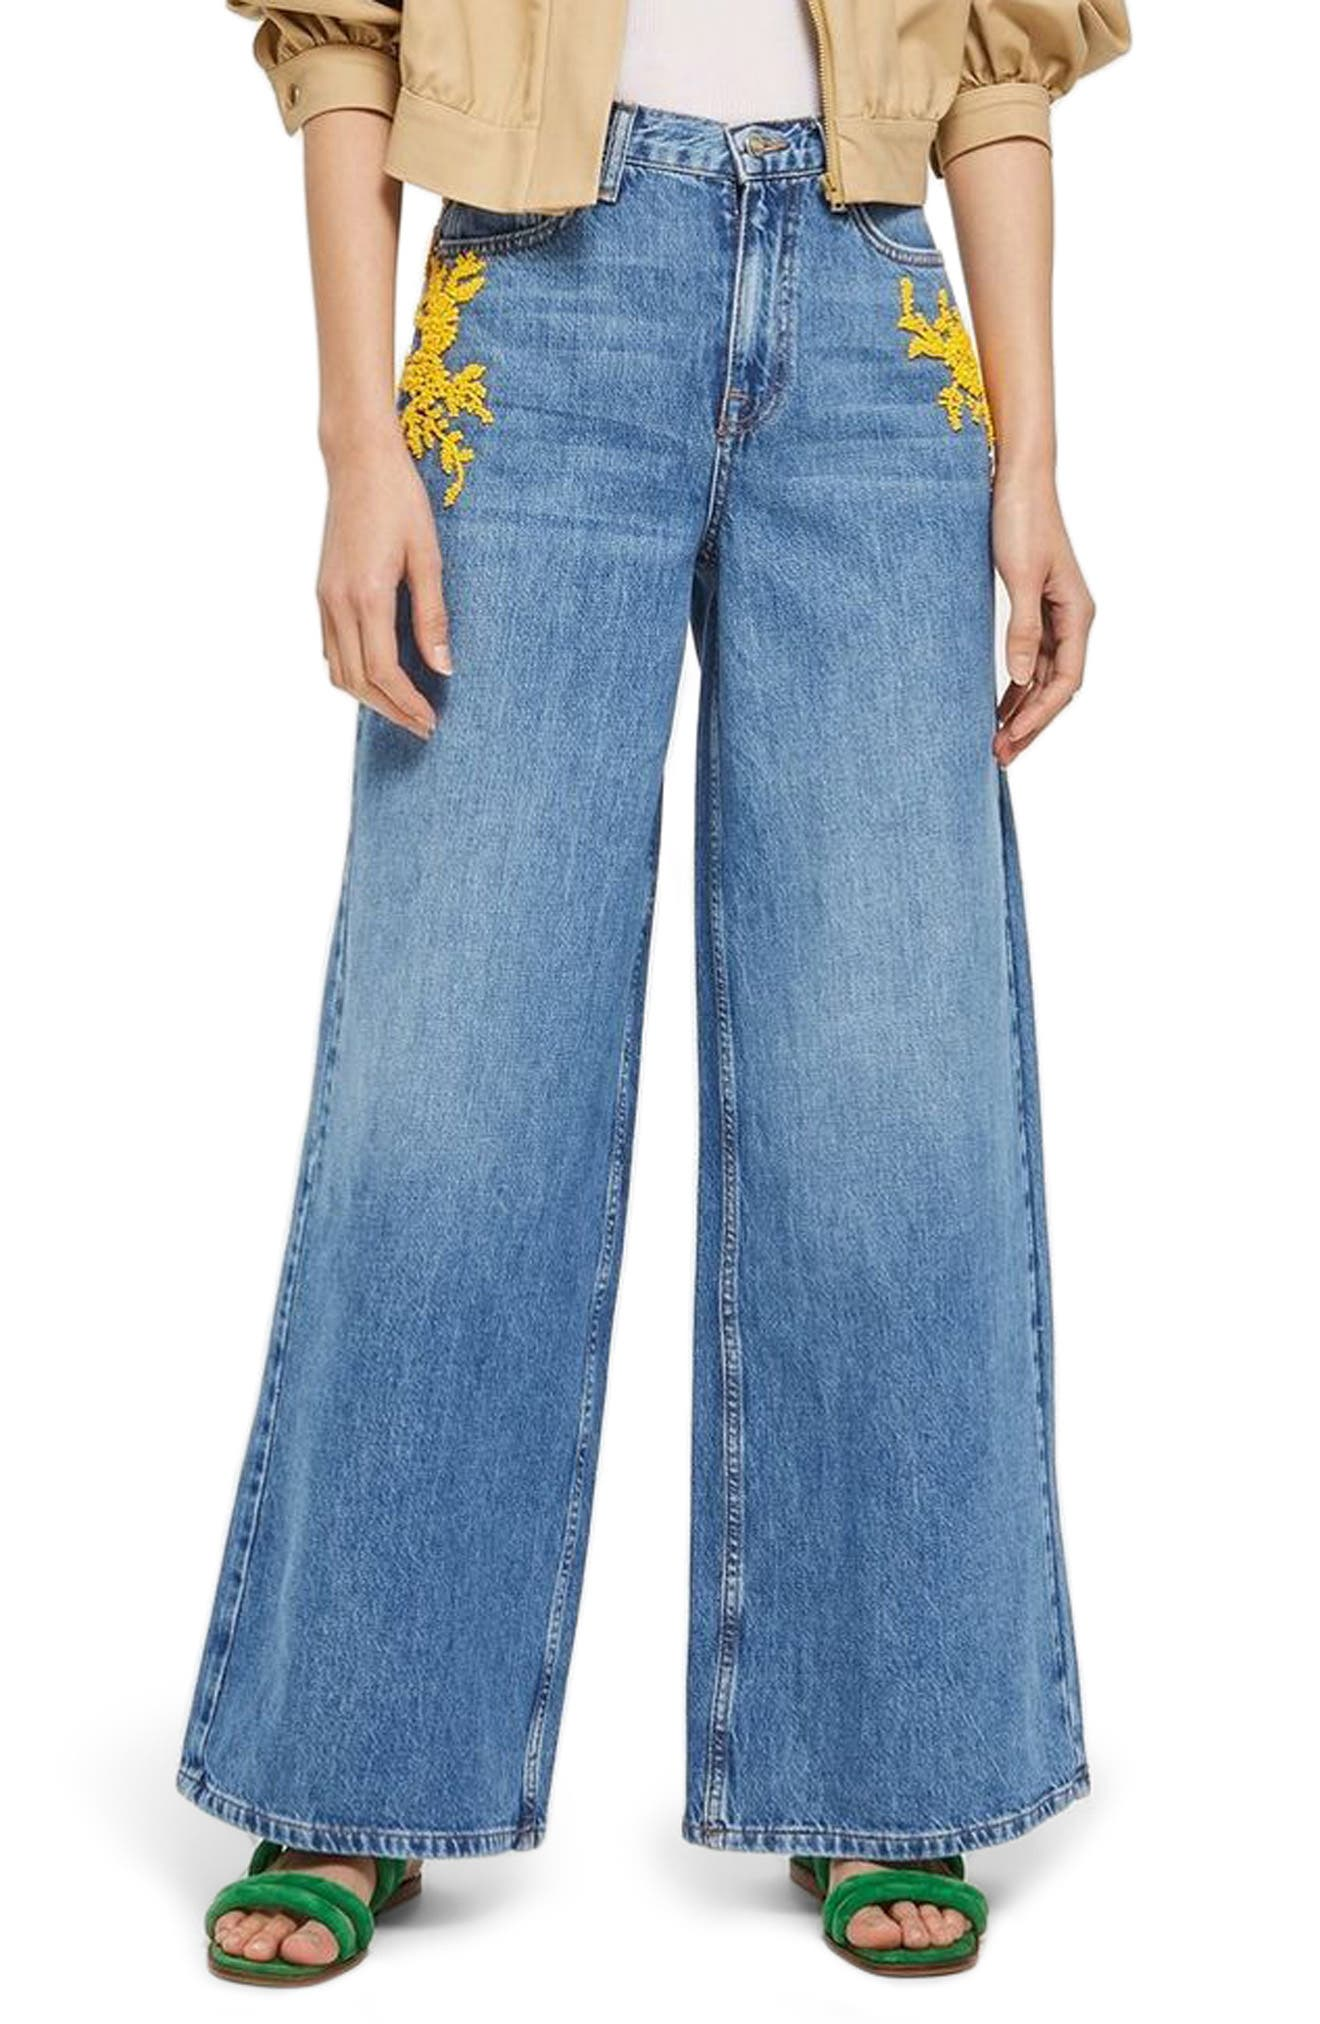 MOTO Bead Detail Wide Leg Non-Stretch Jeans,                         Main,                         color, Mid Denim